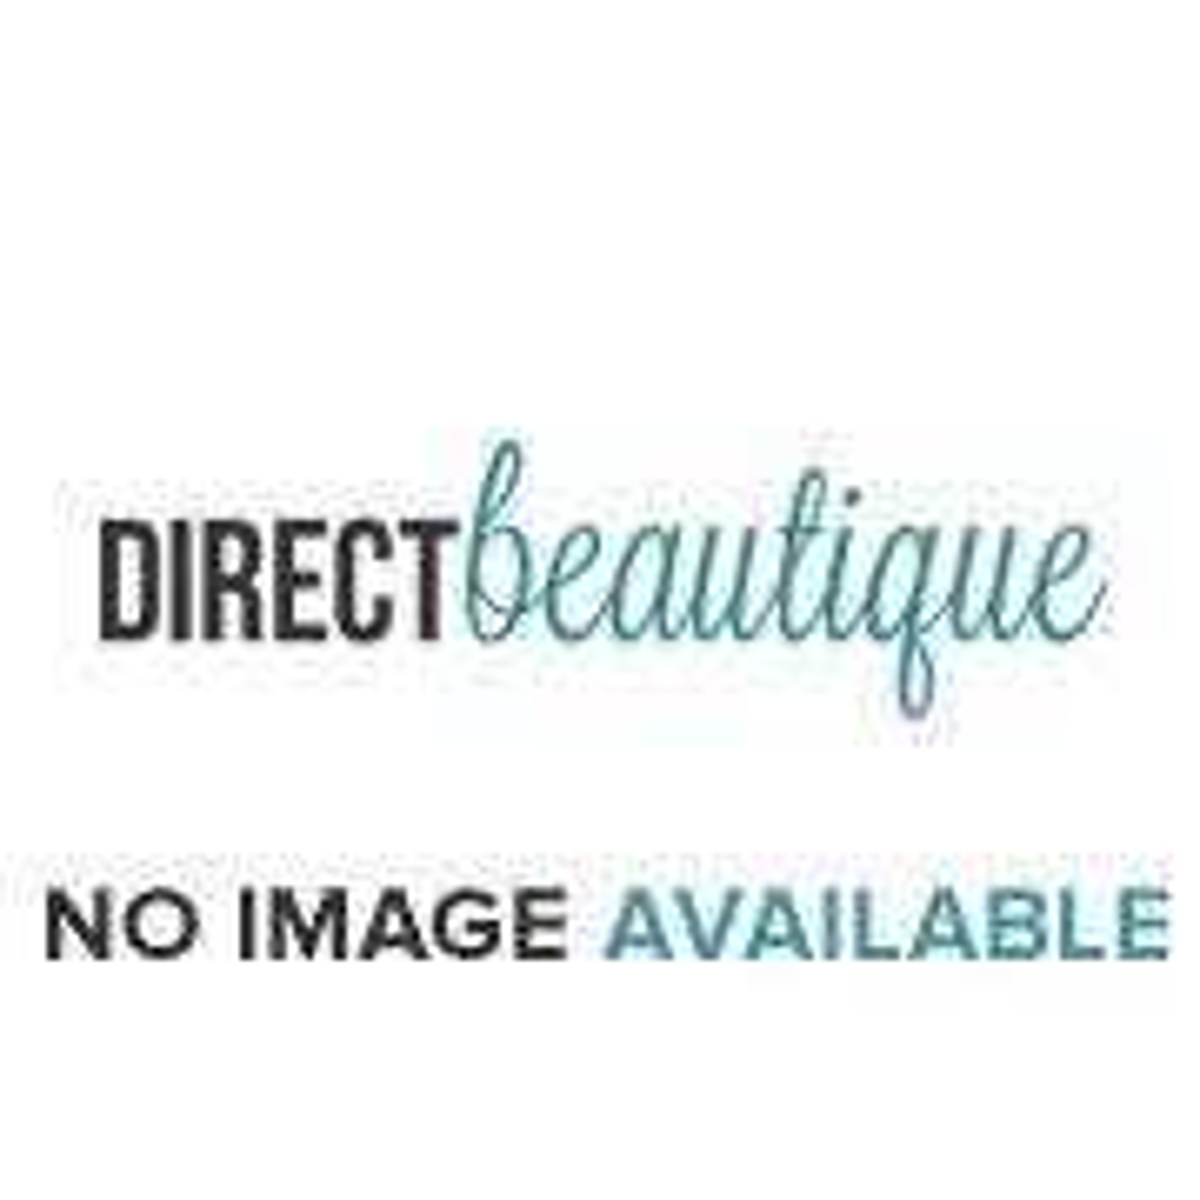 Thierry Mugler Alien Essence Absolue 60ml Refillable Stones EDP Spray